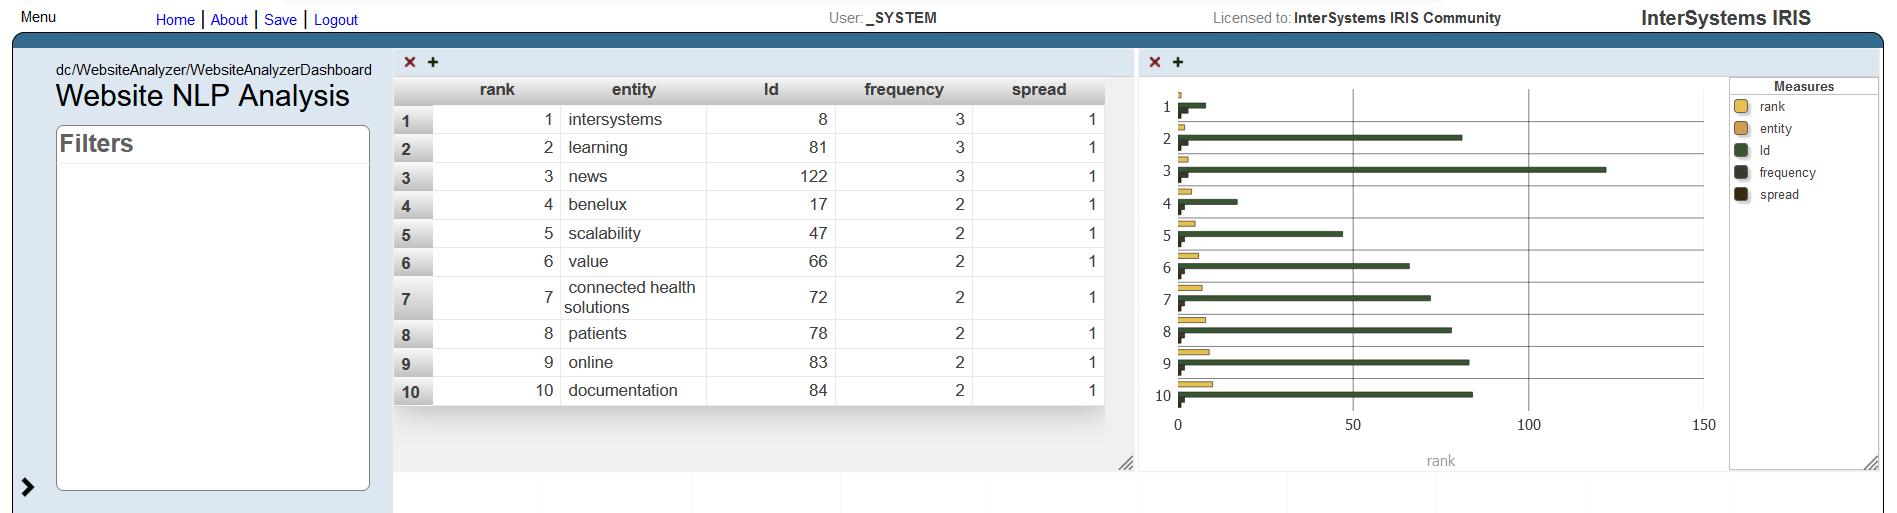 NLP metrics into User Portal